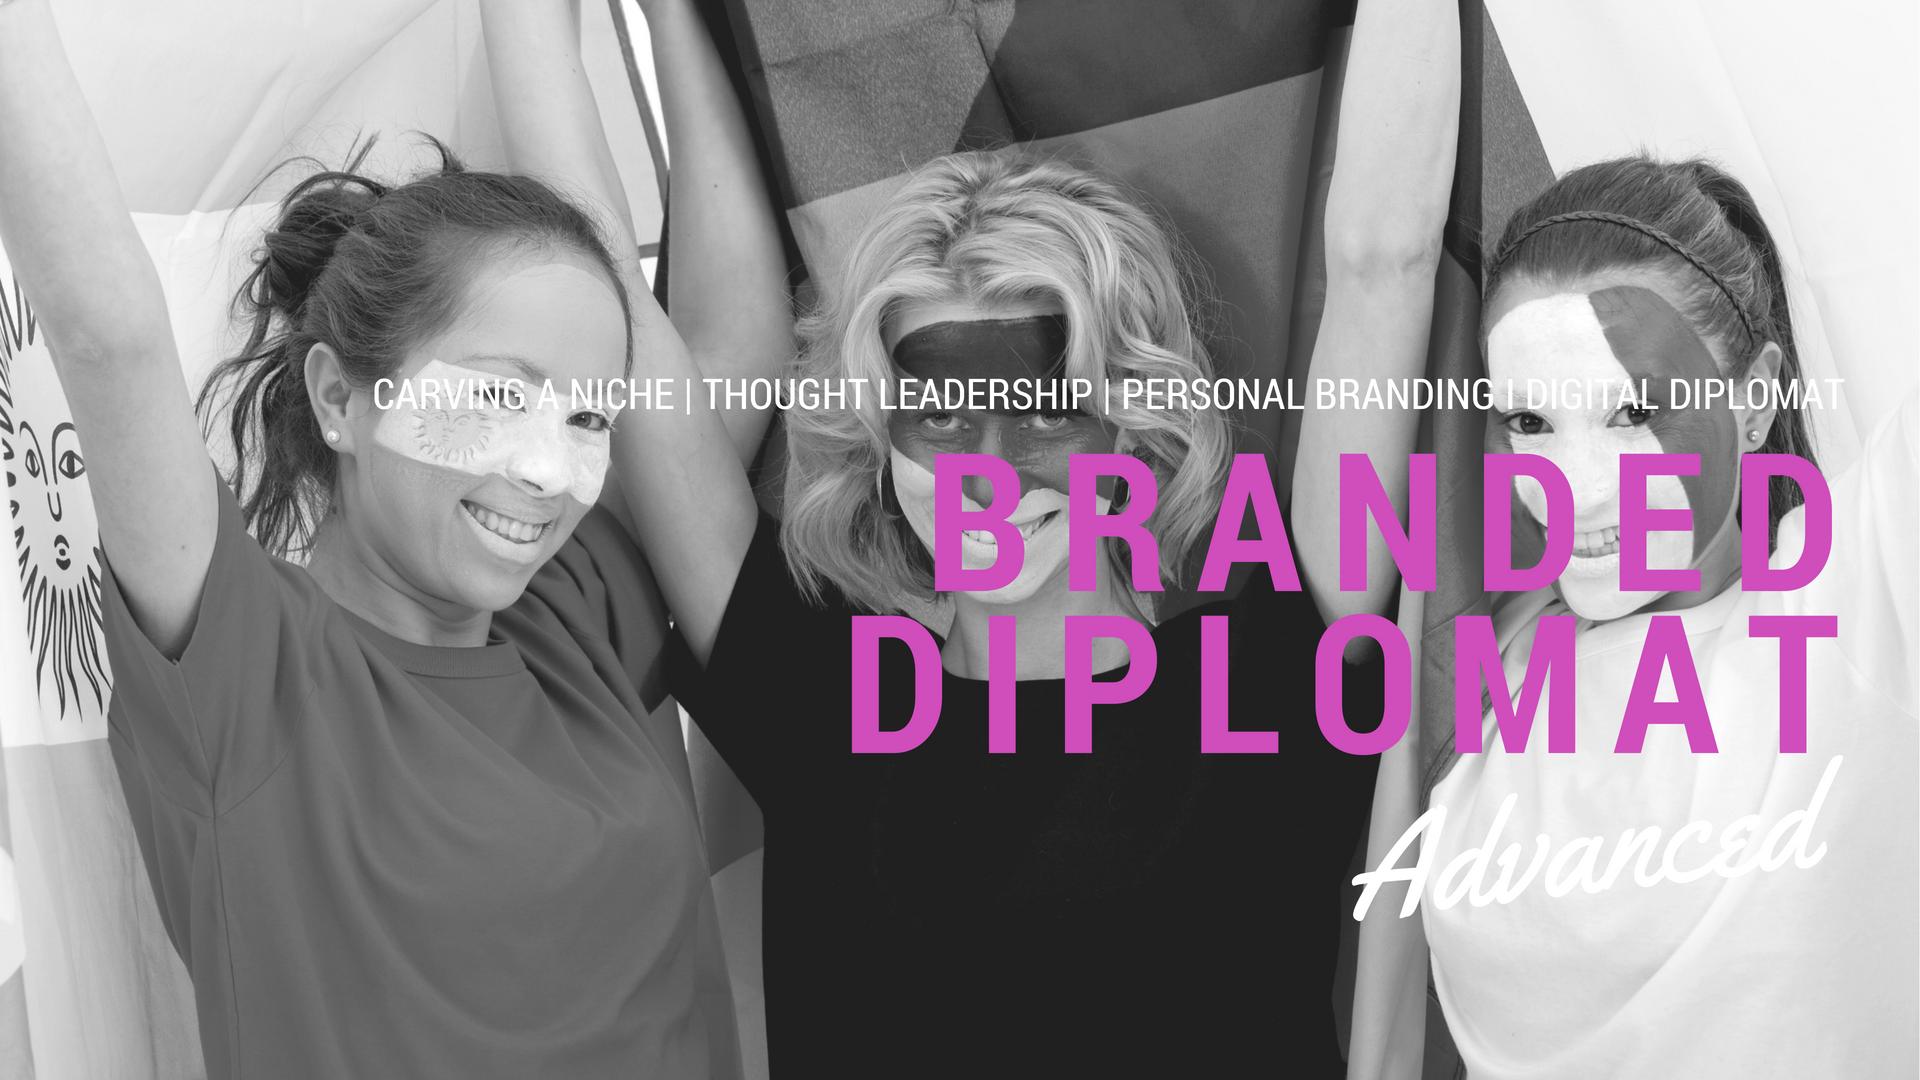 11 Branded diplomat.png